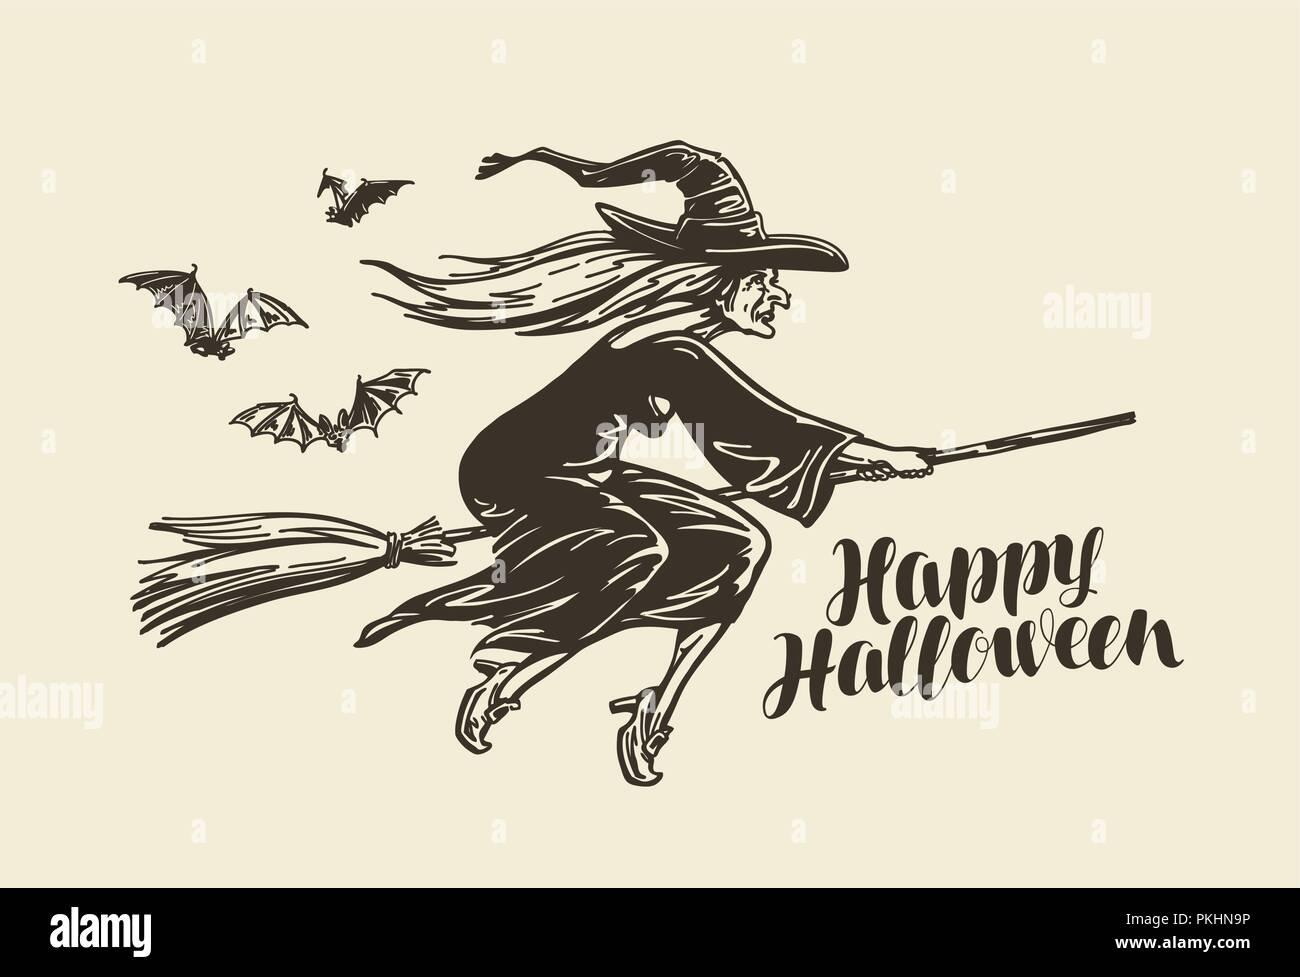 Halloween, Grußkarte. Alte Hexe auf Besen fliegen. Vintage Skizze Vector Illustration Stockbild